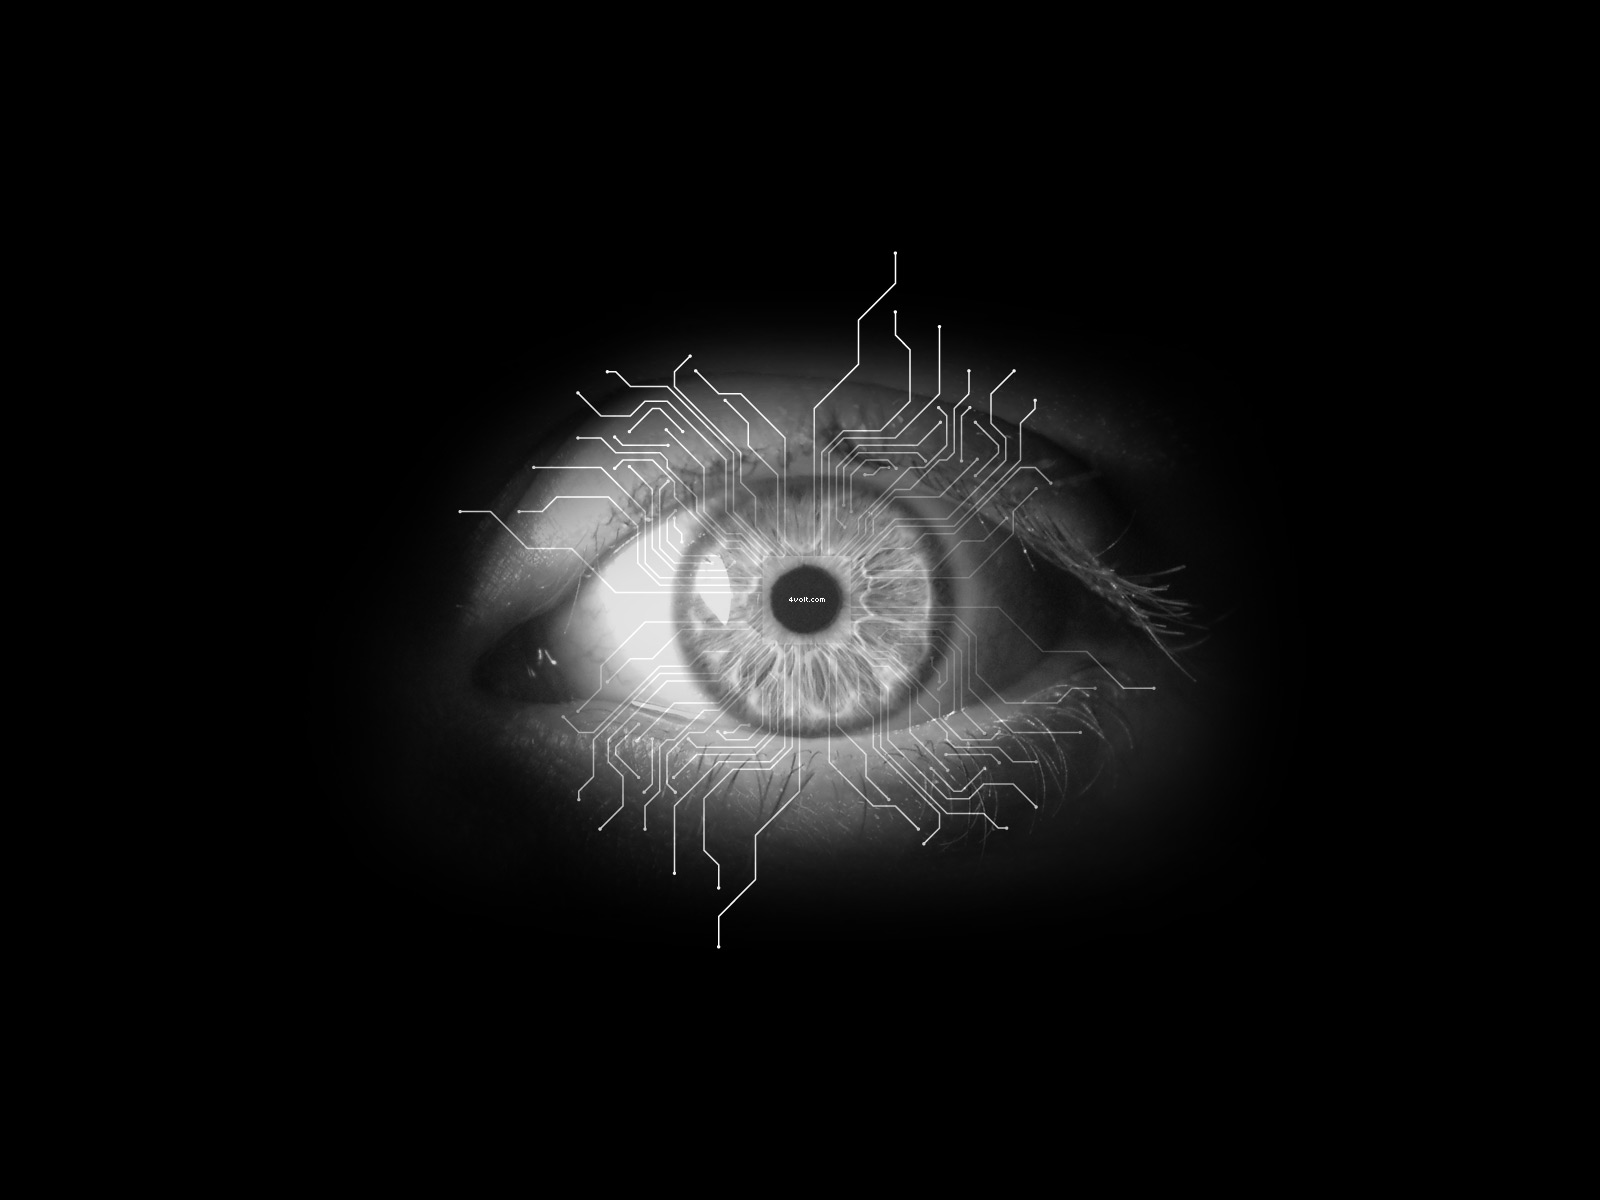 Mais scrap imagens para facebook imagens para google instagram whatsapp tumblr - Eye drawing wallpaper ...